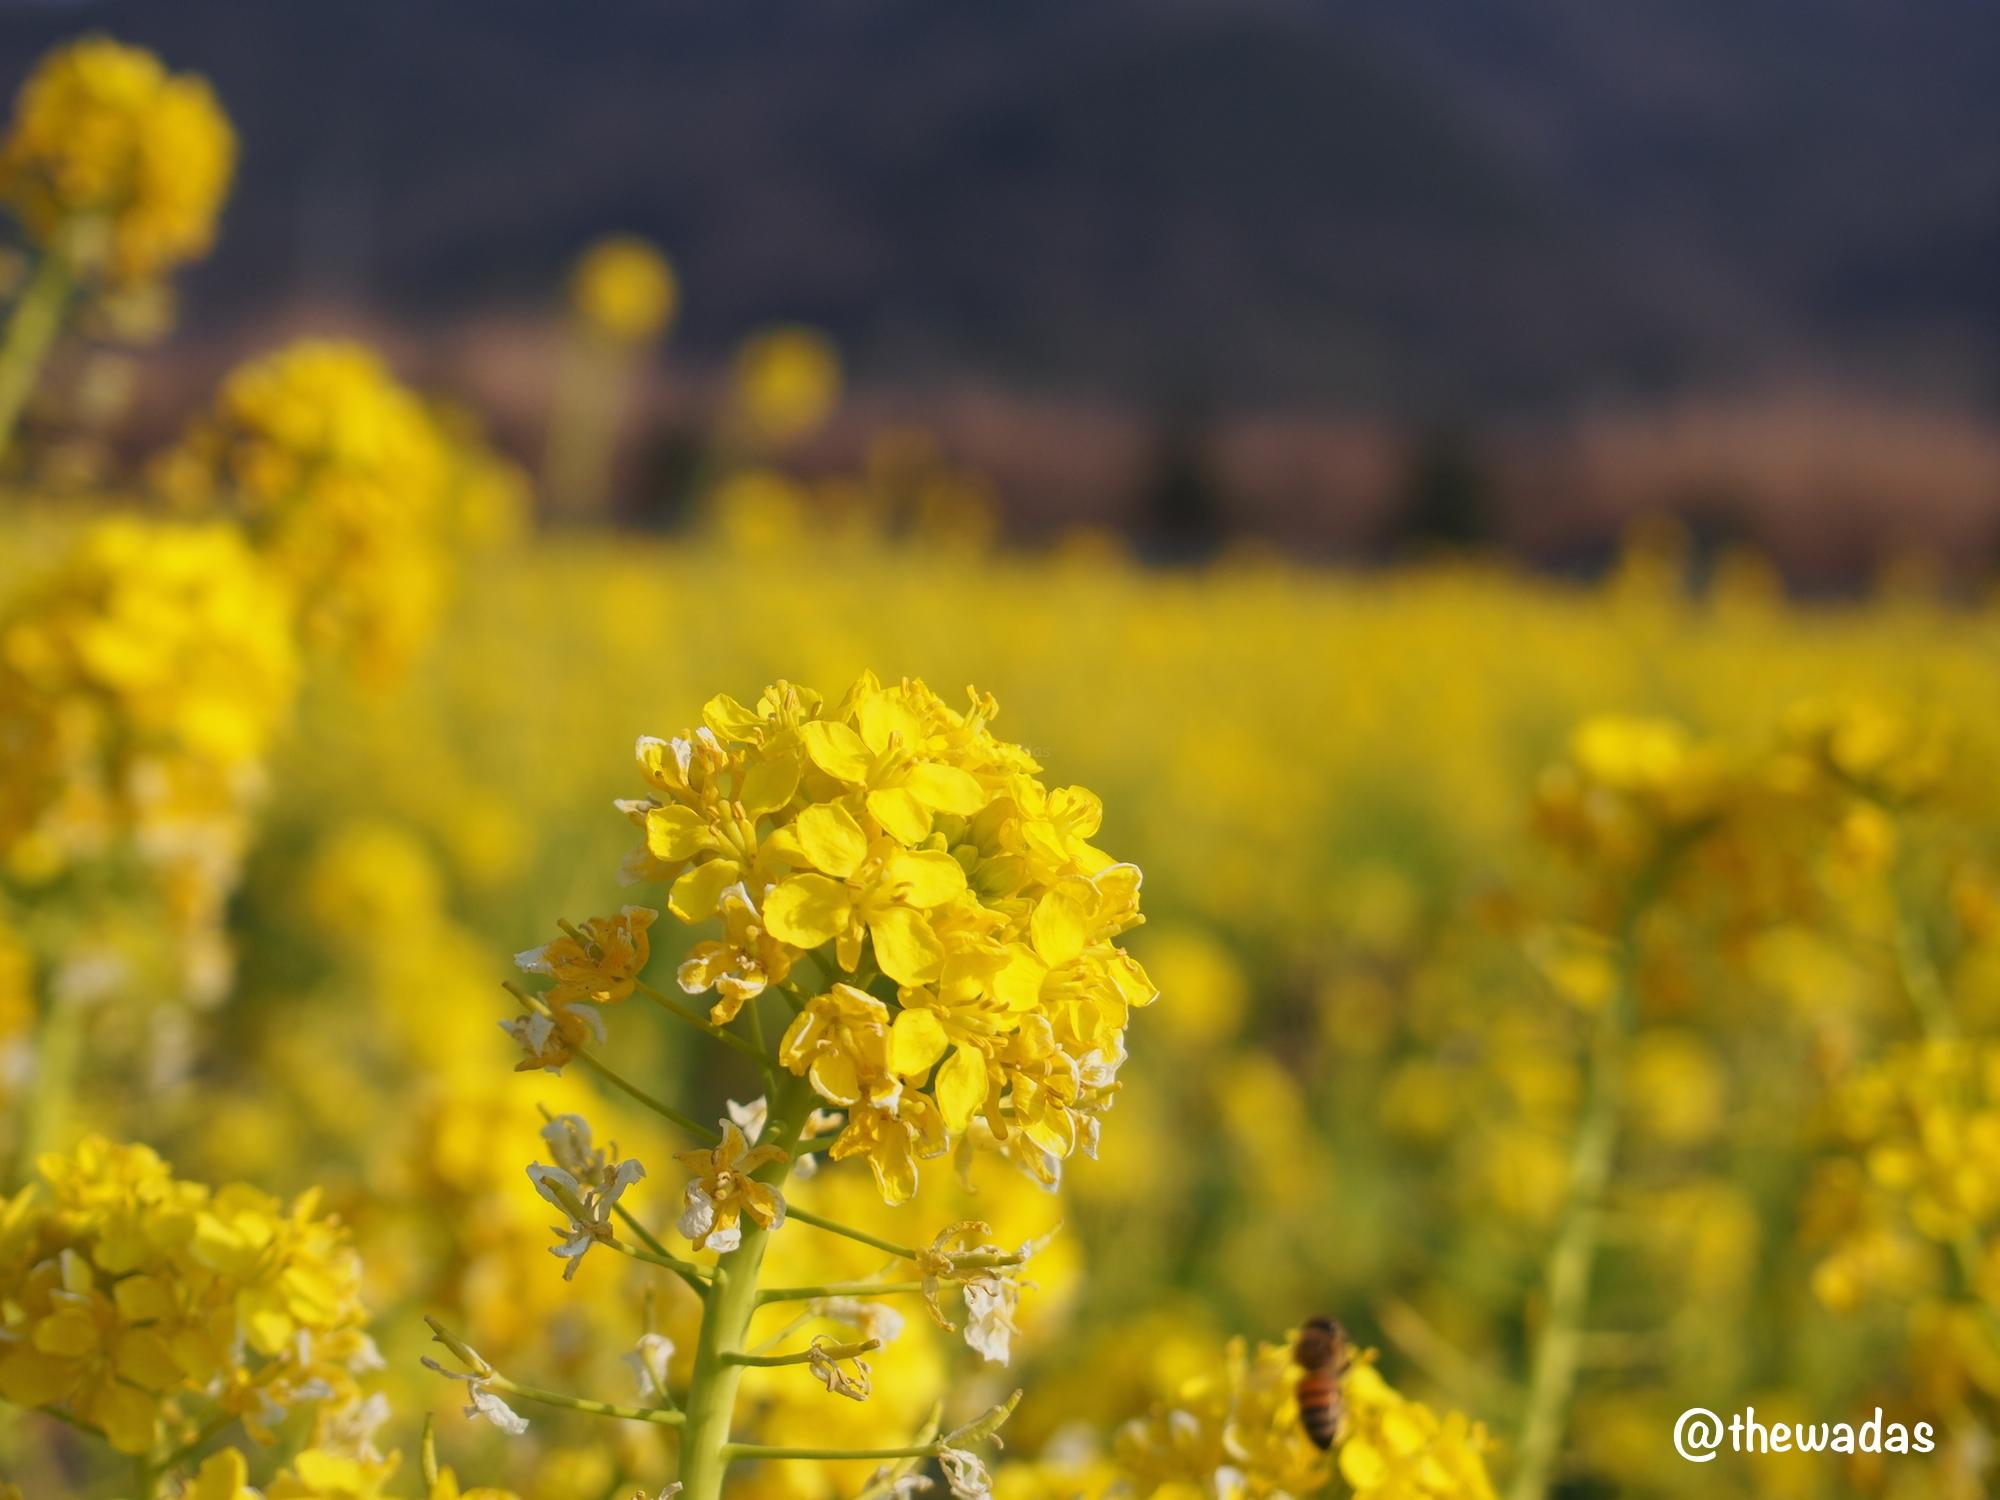 Kasaoka Bayfarm: Nanohana rapeseed flower field, flower closeup